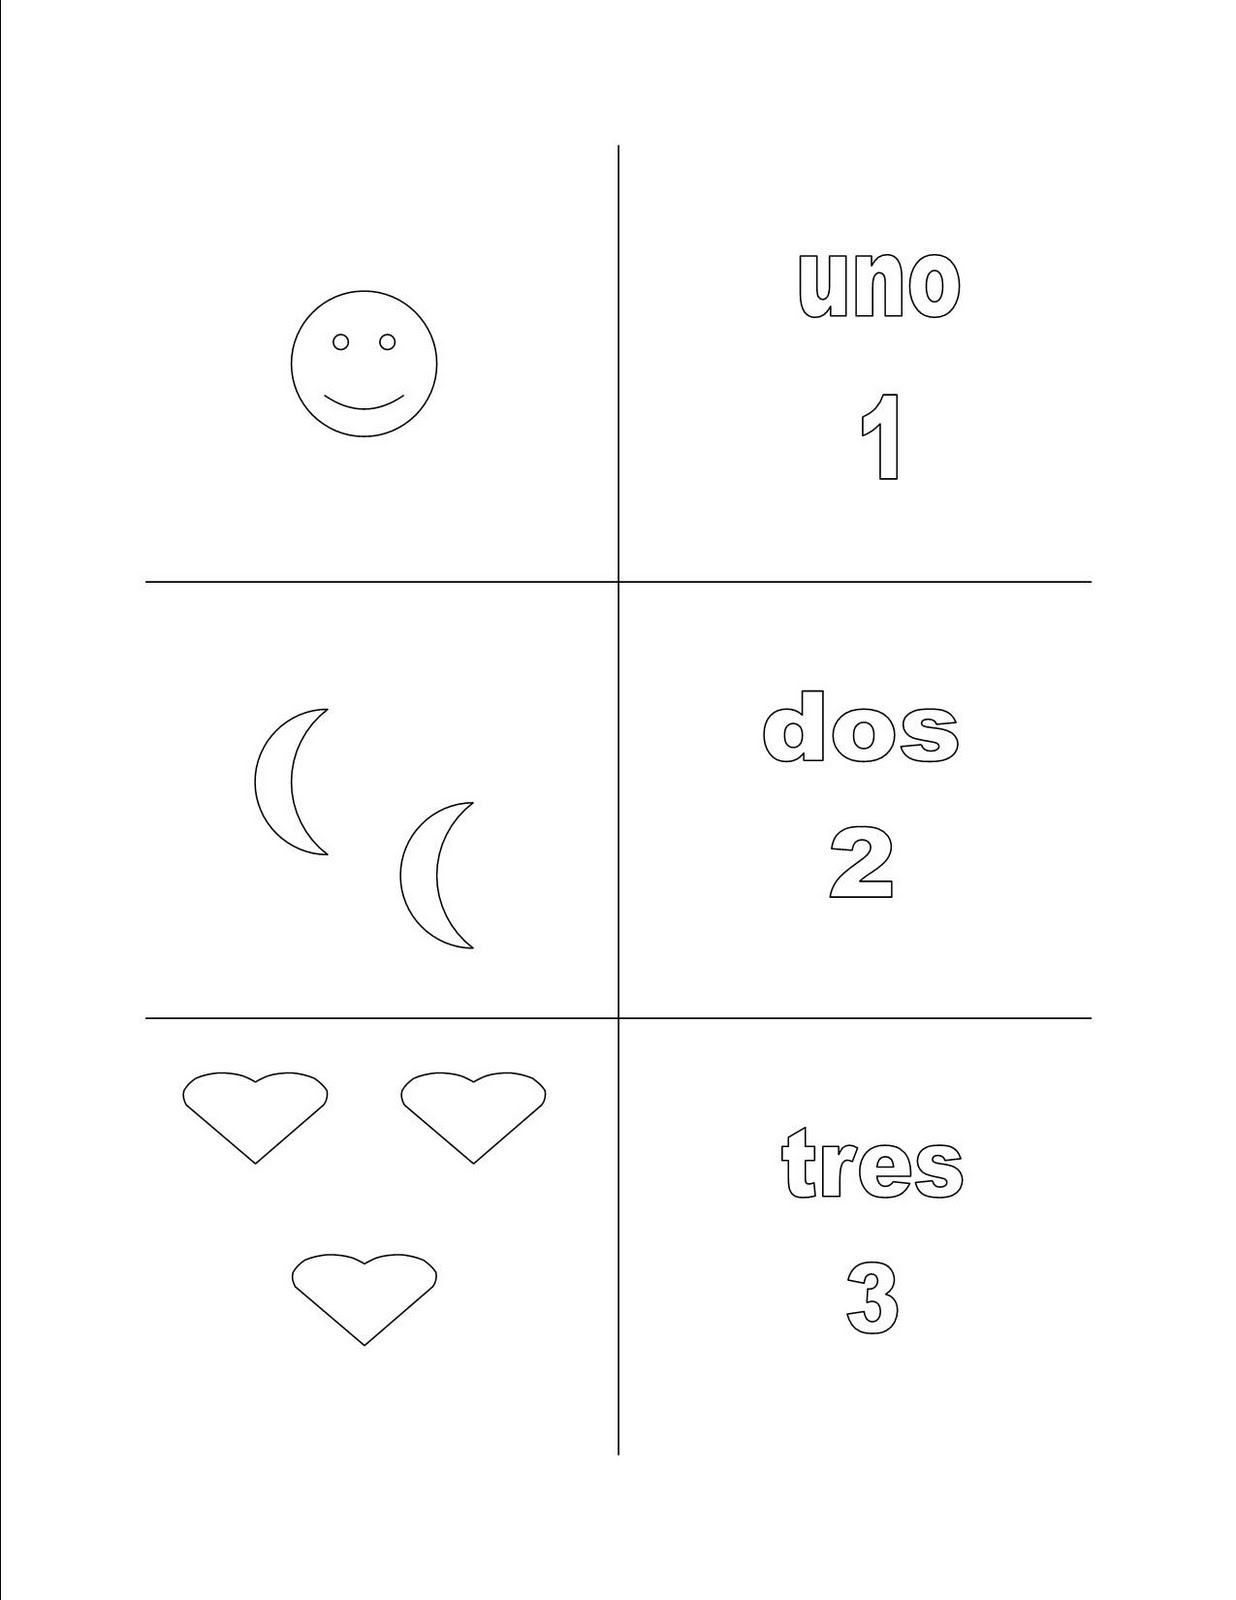 Spanish For Little Learners December